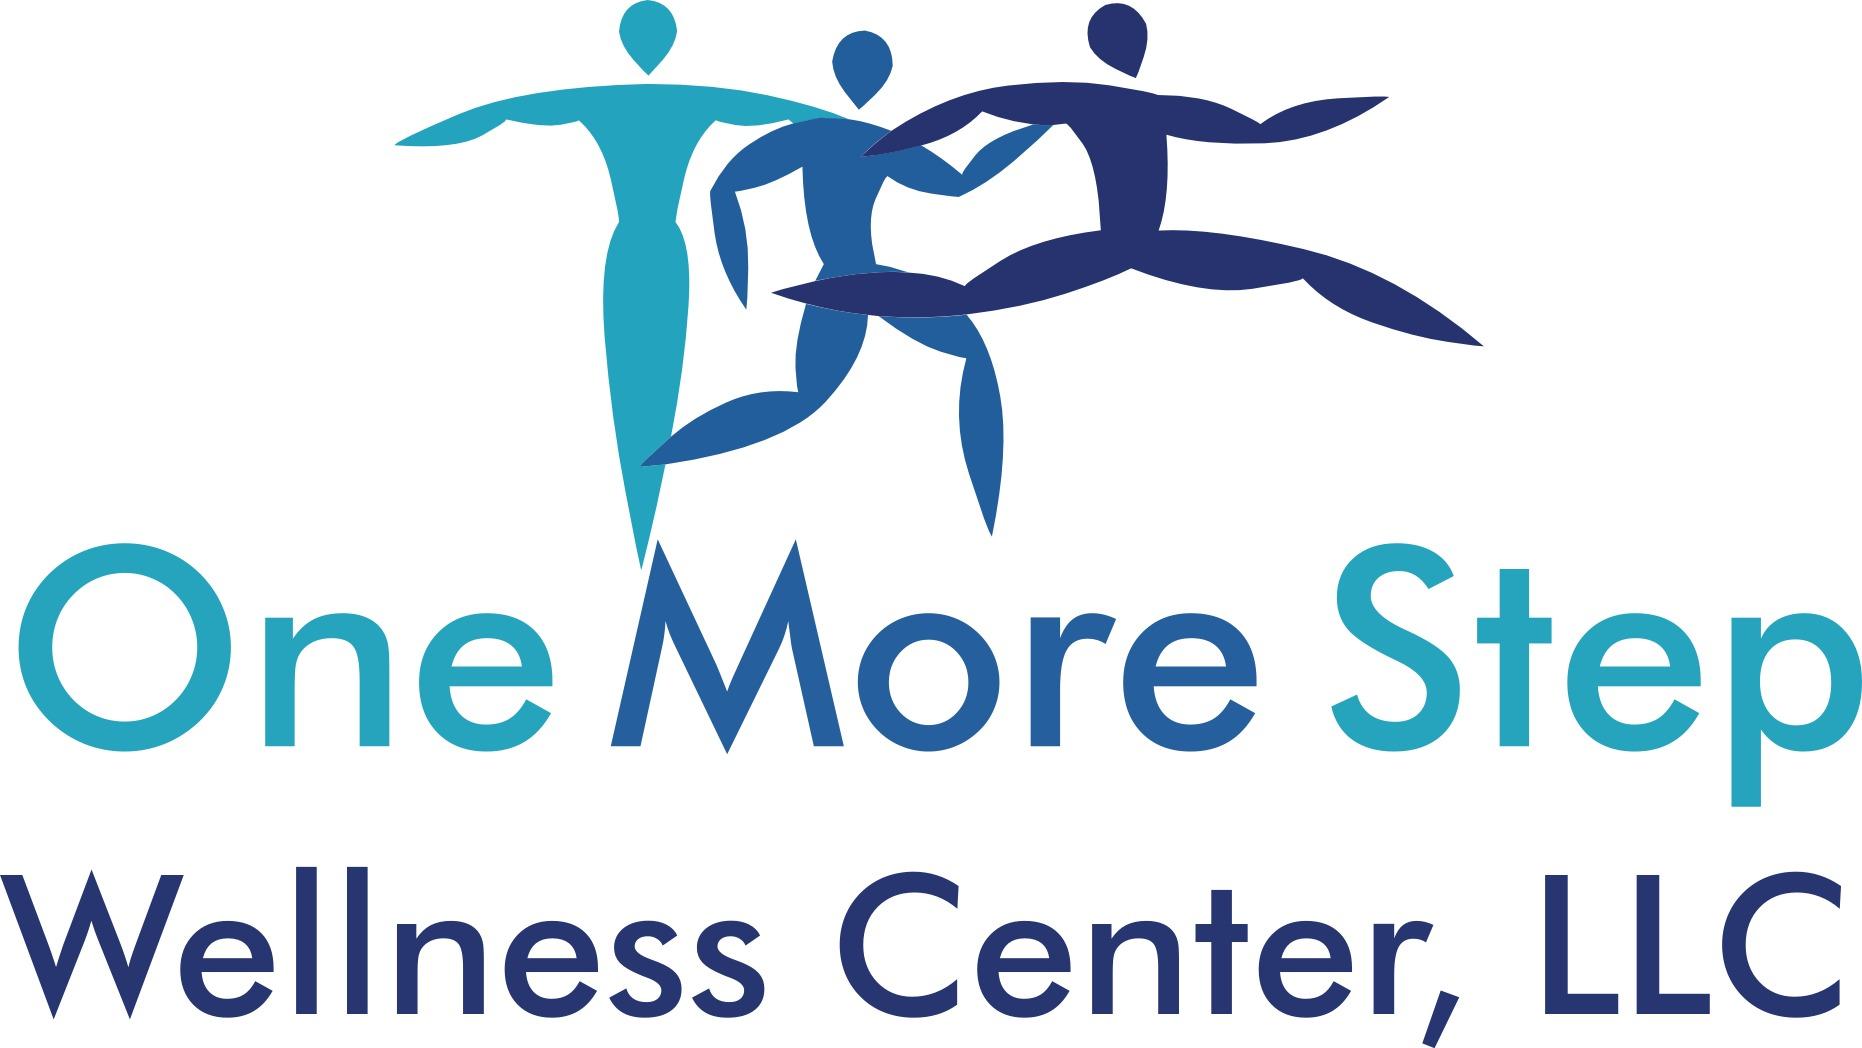 One More Step Wellness Center, LLC